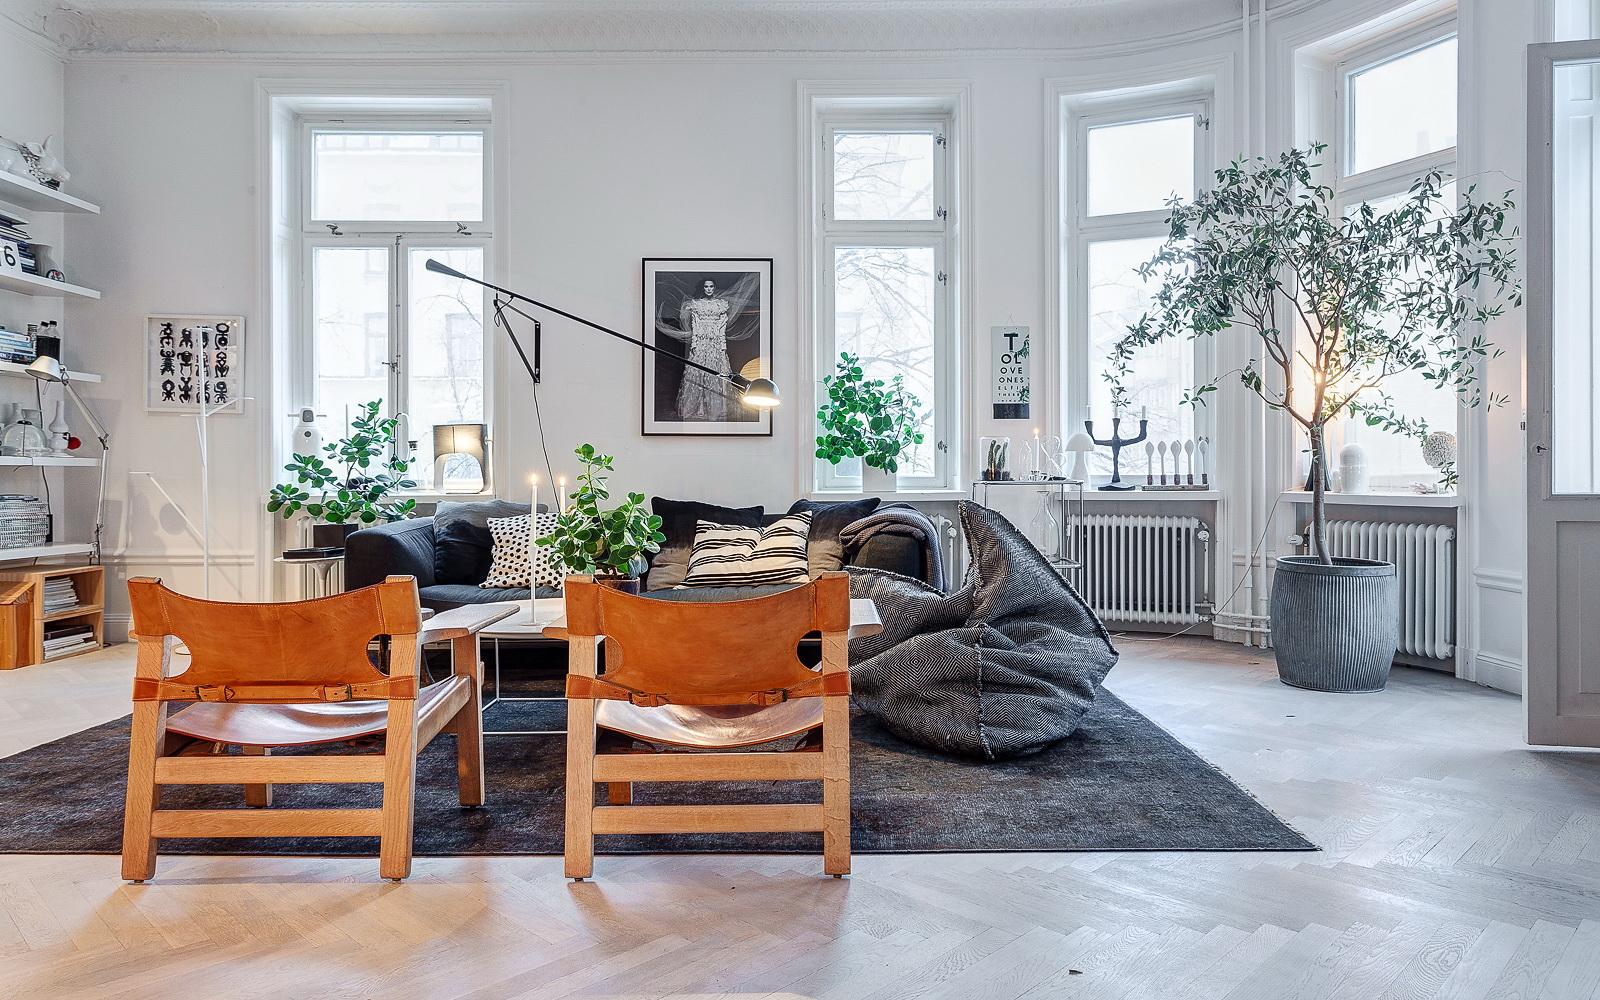 Arredamento Stile Nordico Moderno.Inspiring Apartment At Odengatan 35